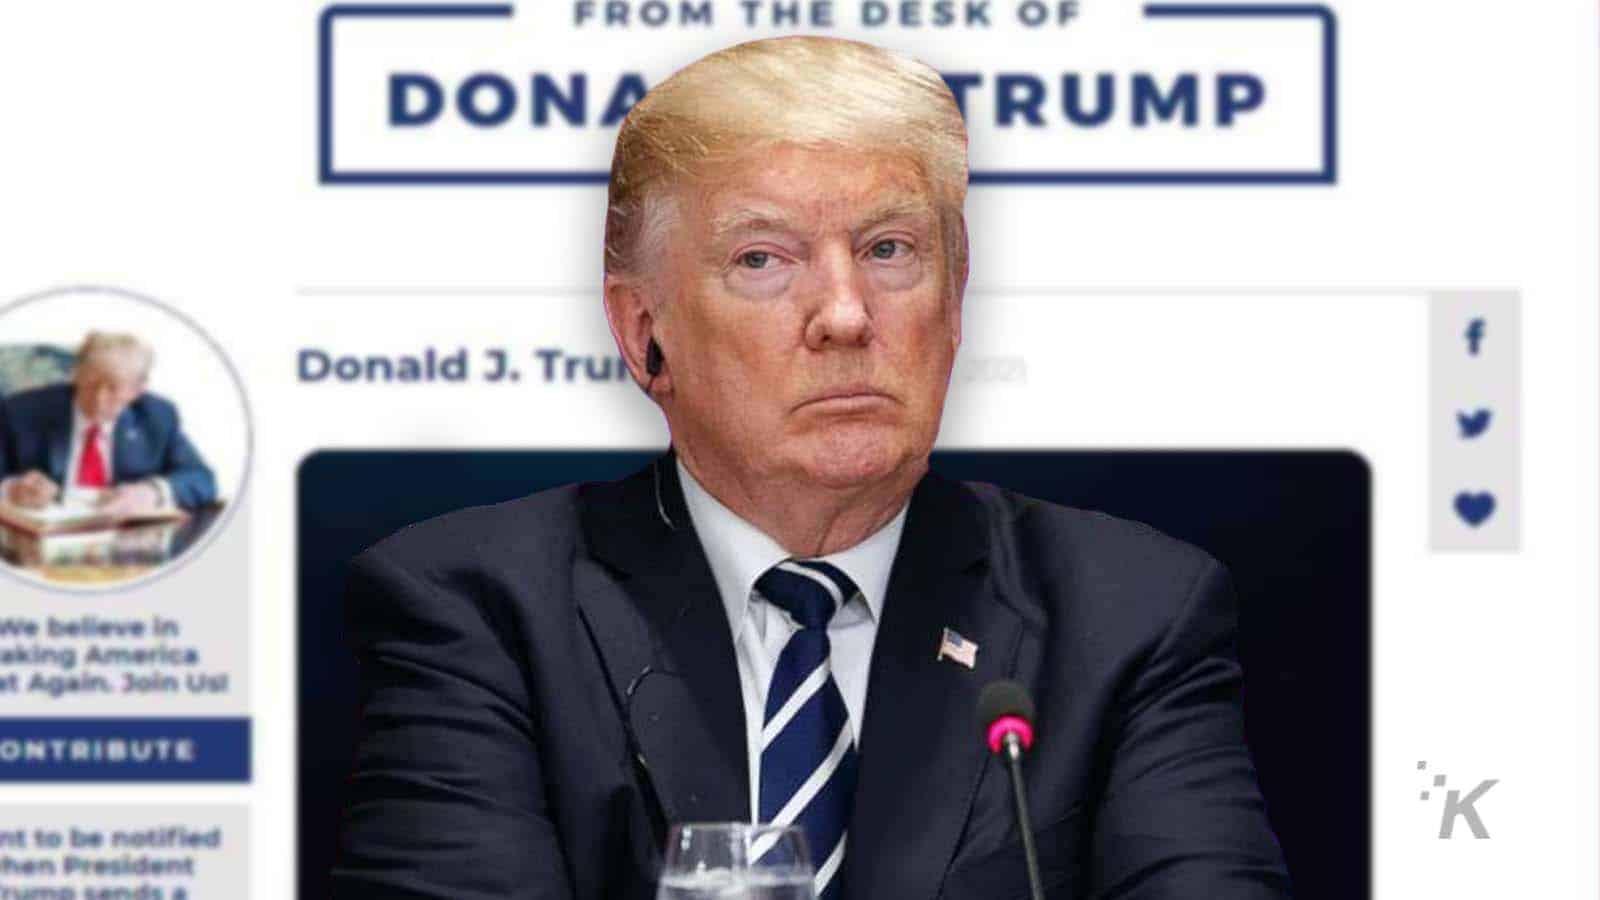 donald trump website shut down